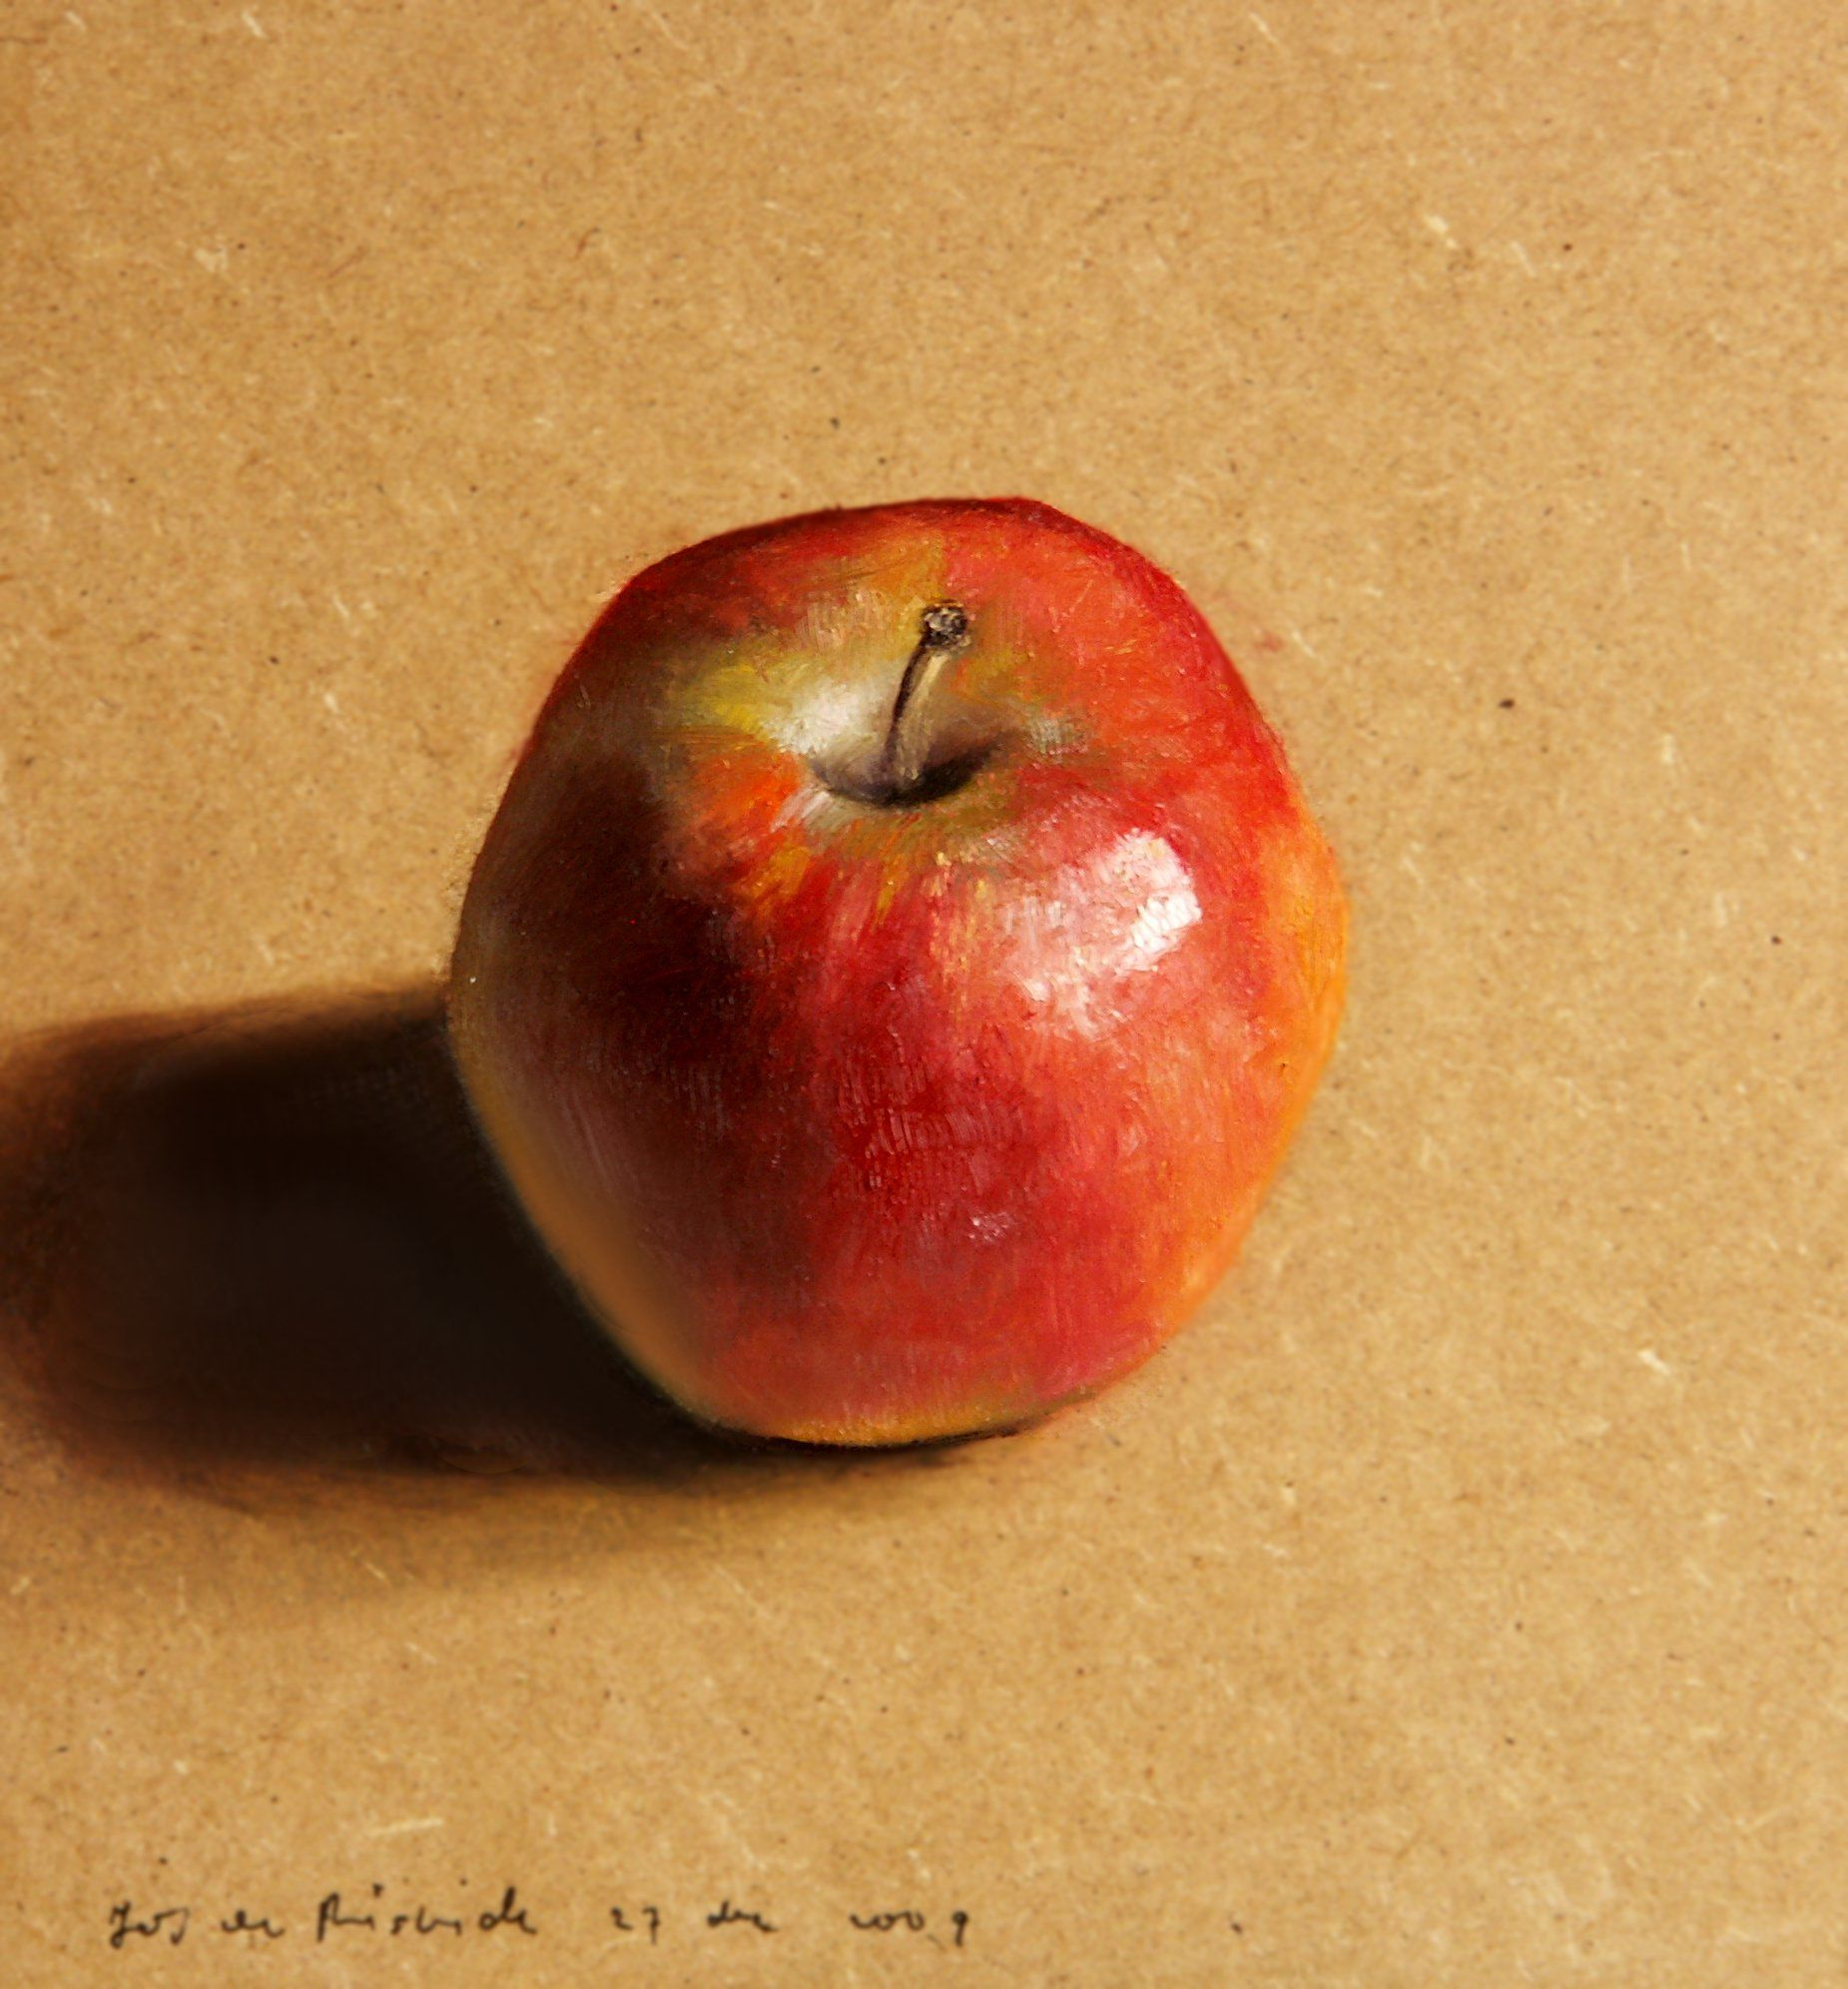 jos van riswick apple - Google Search   Still lifes I like ...